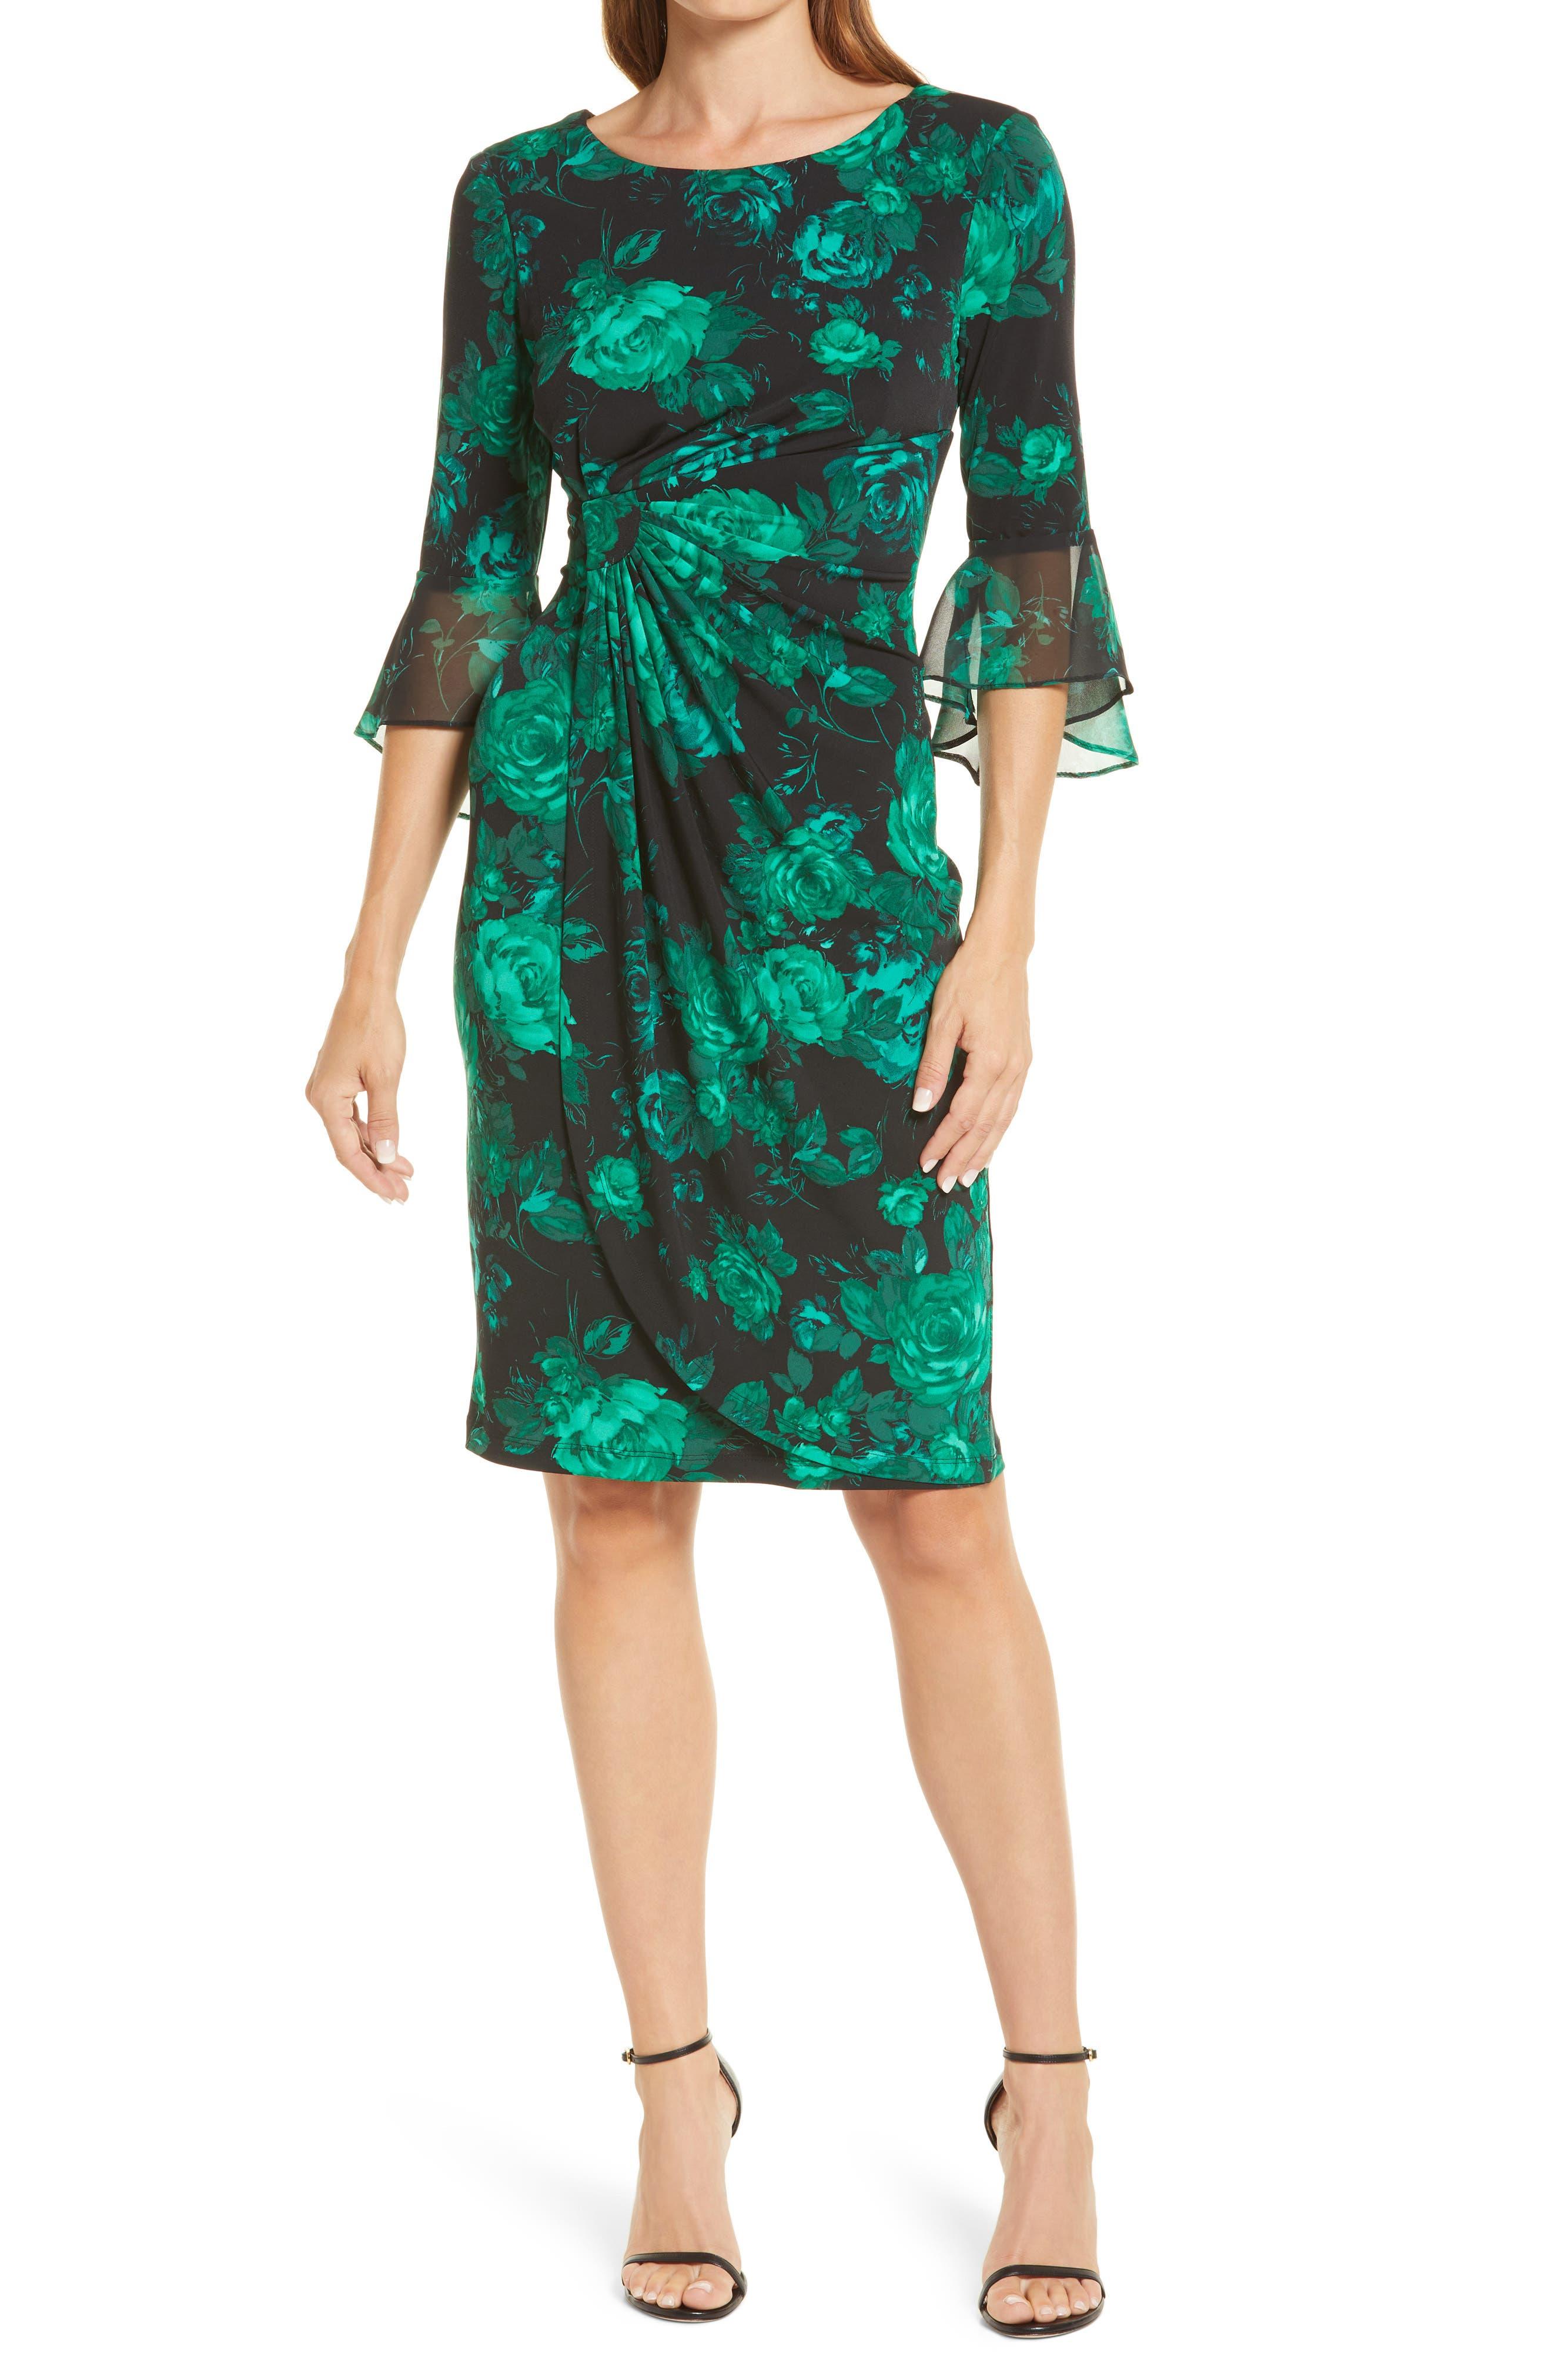 Floral Chiffon Bell Sleeve Dress